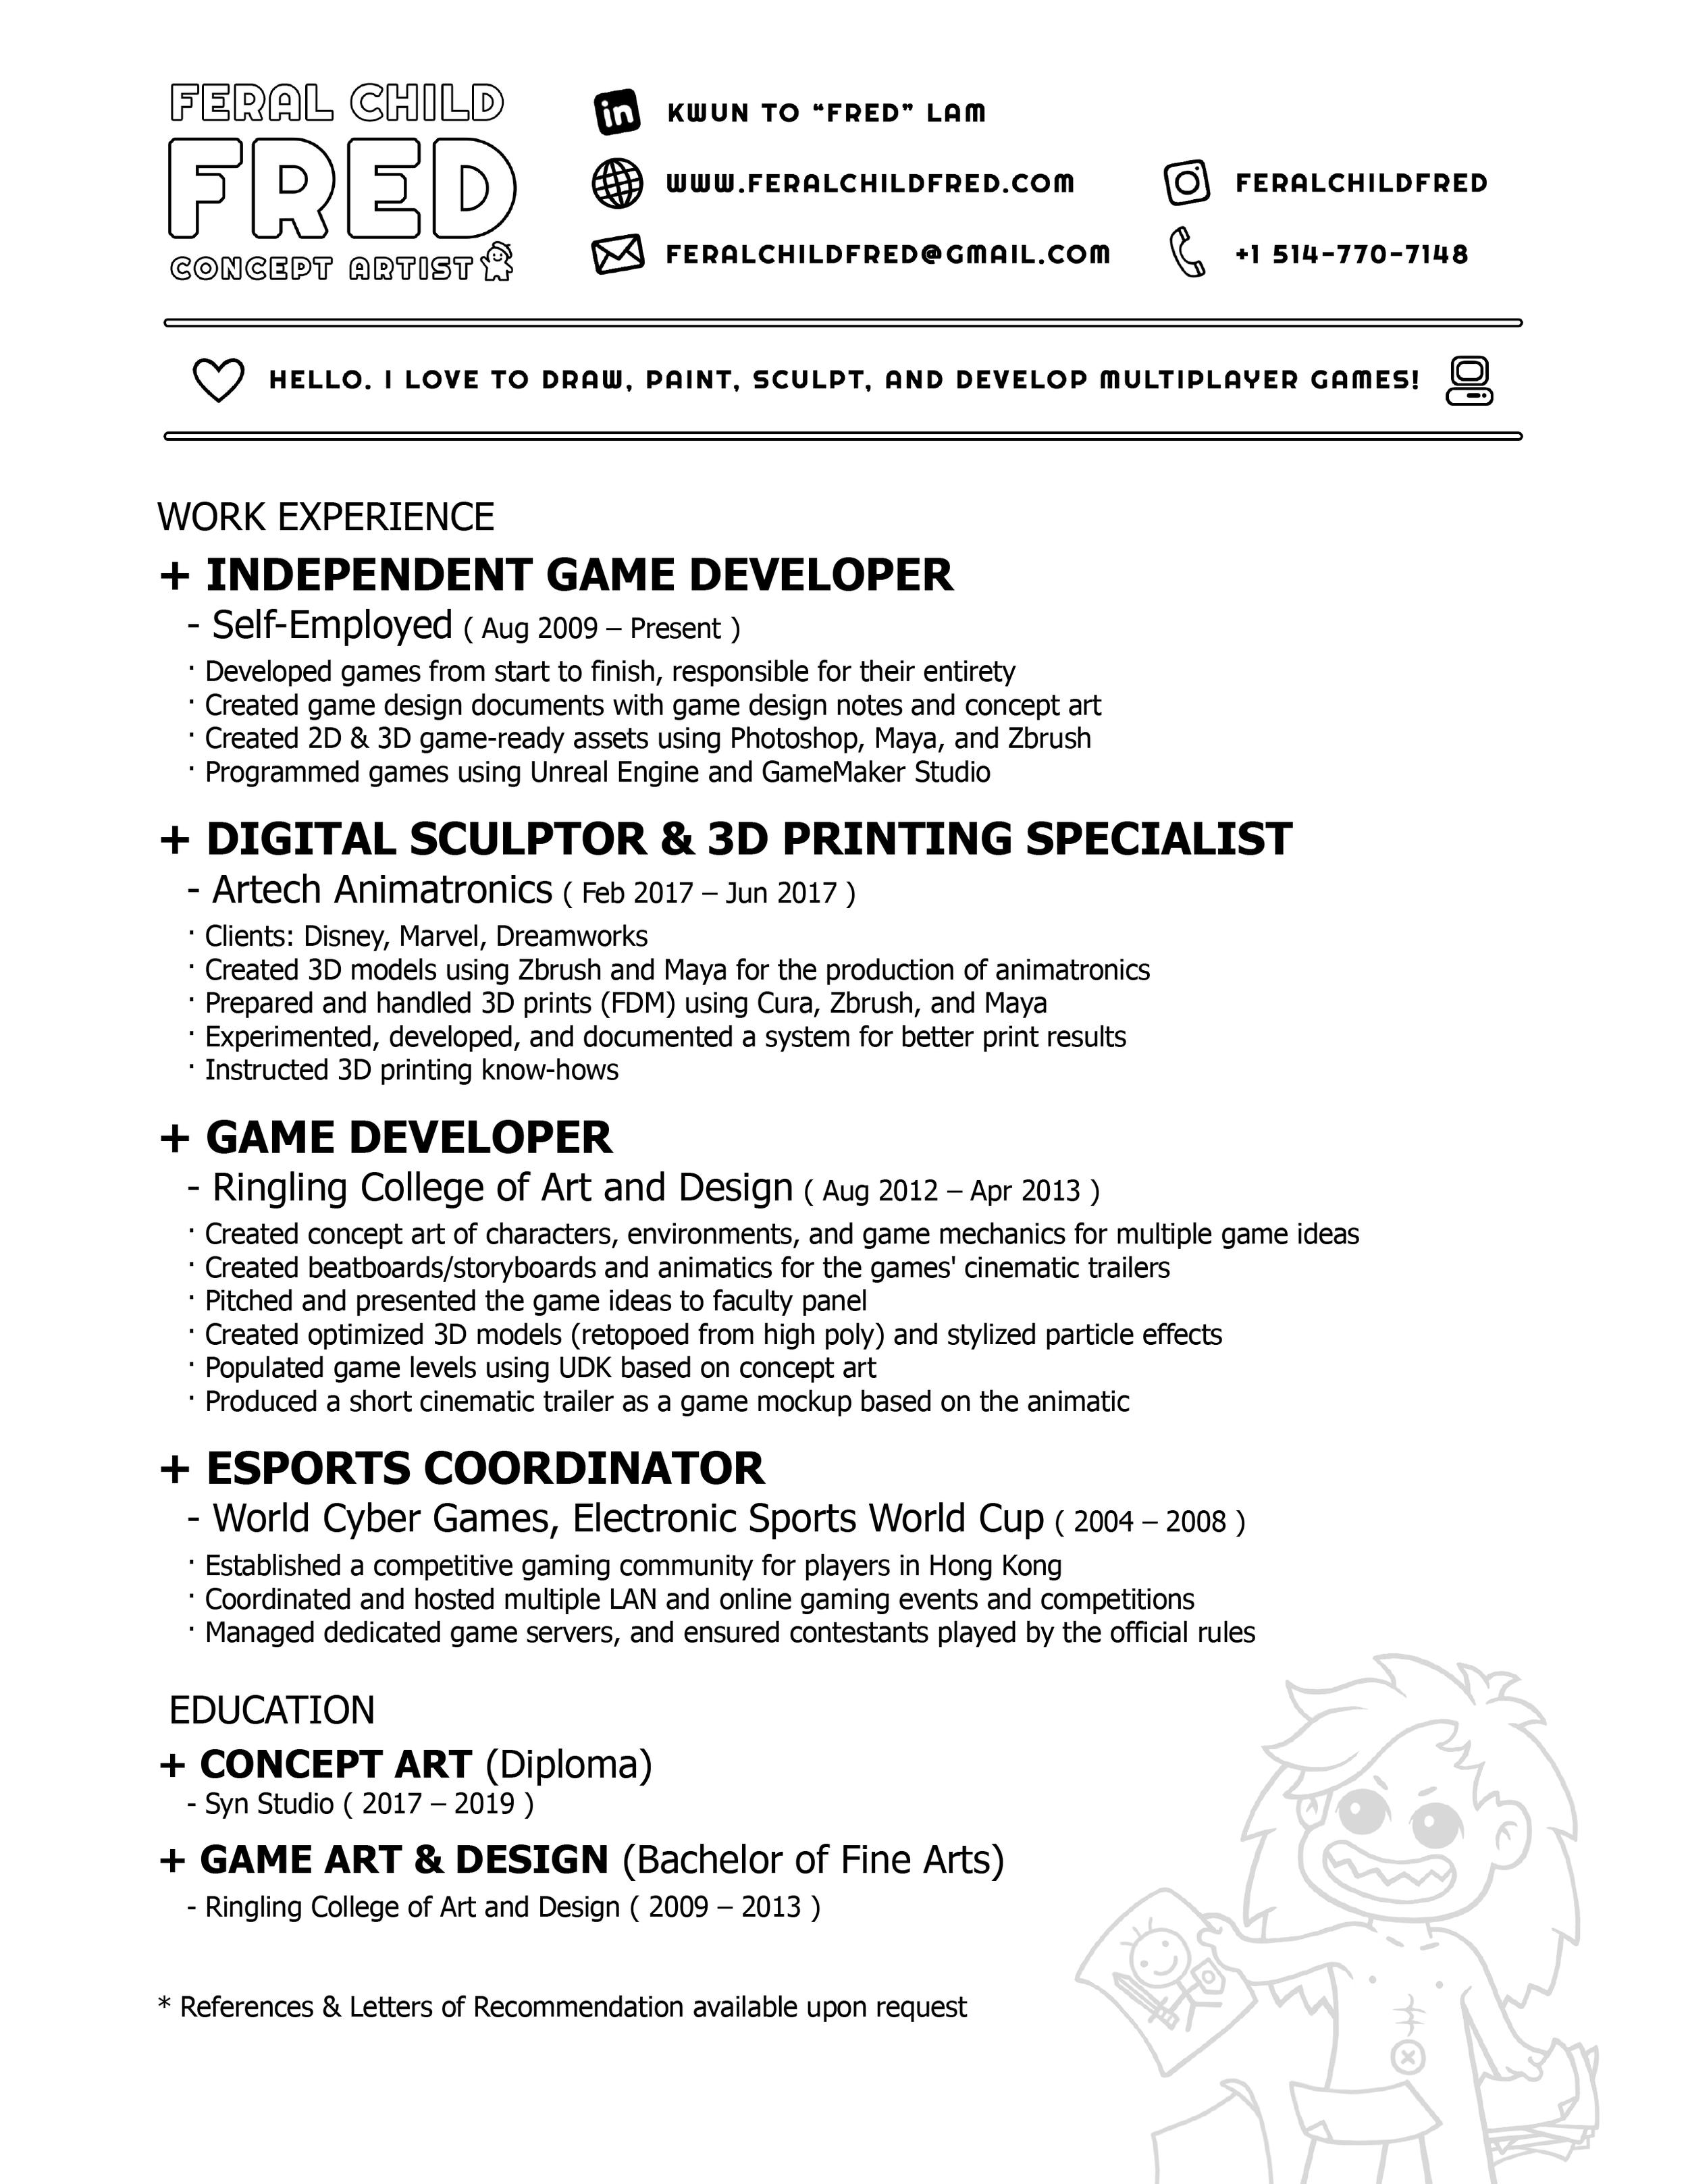 FREDKwunToLAM_Resume.png